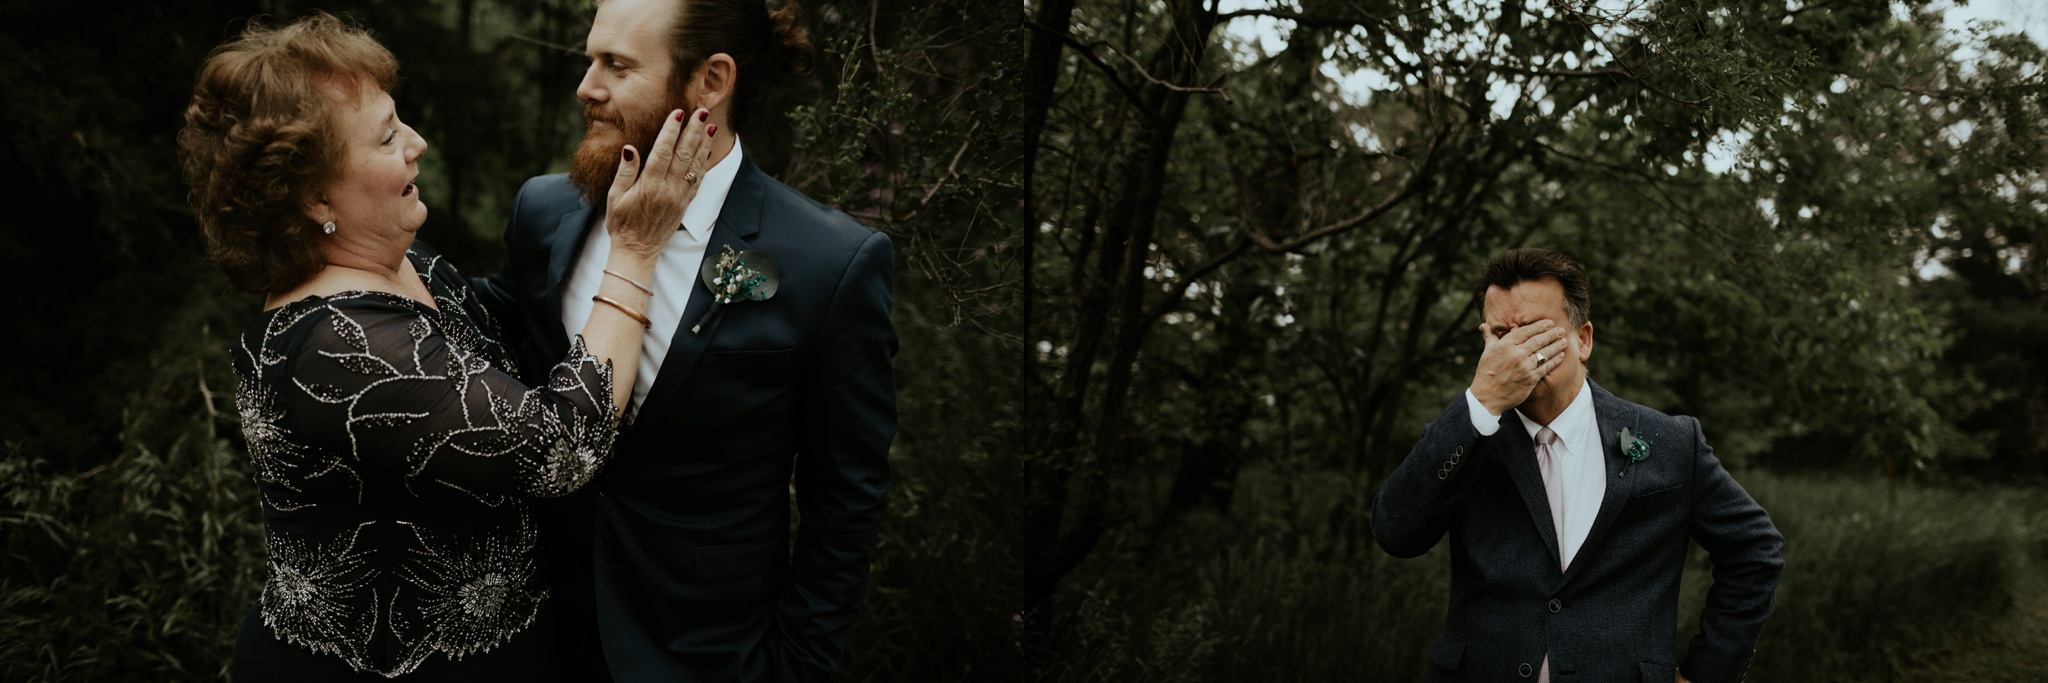 trinjensen photography, nebraska outdoor wedding photographer_3028.jpg